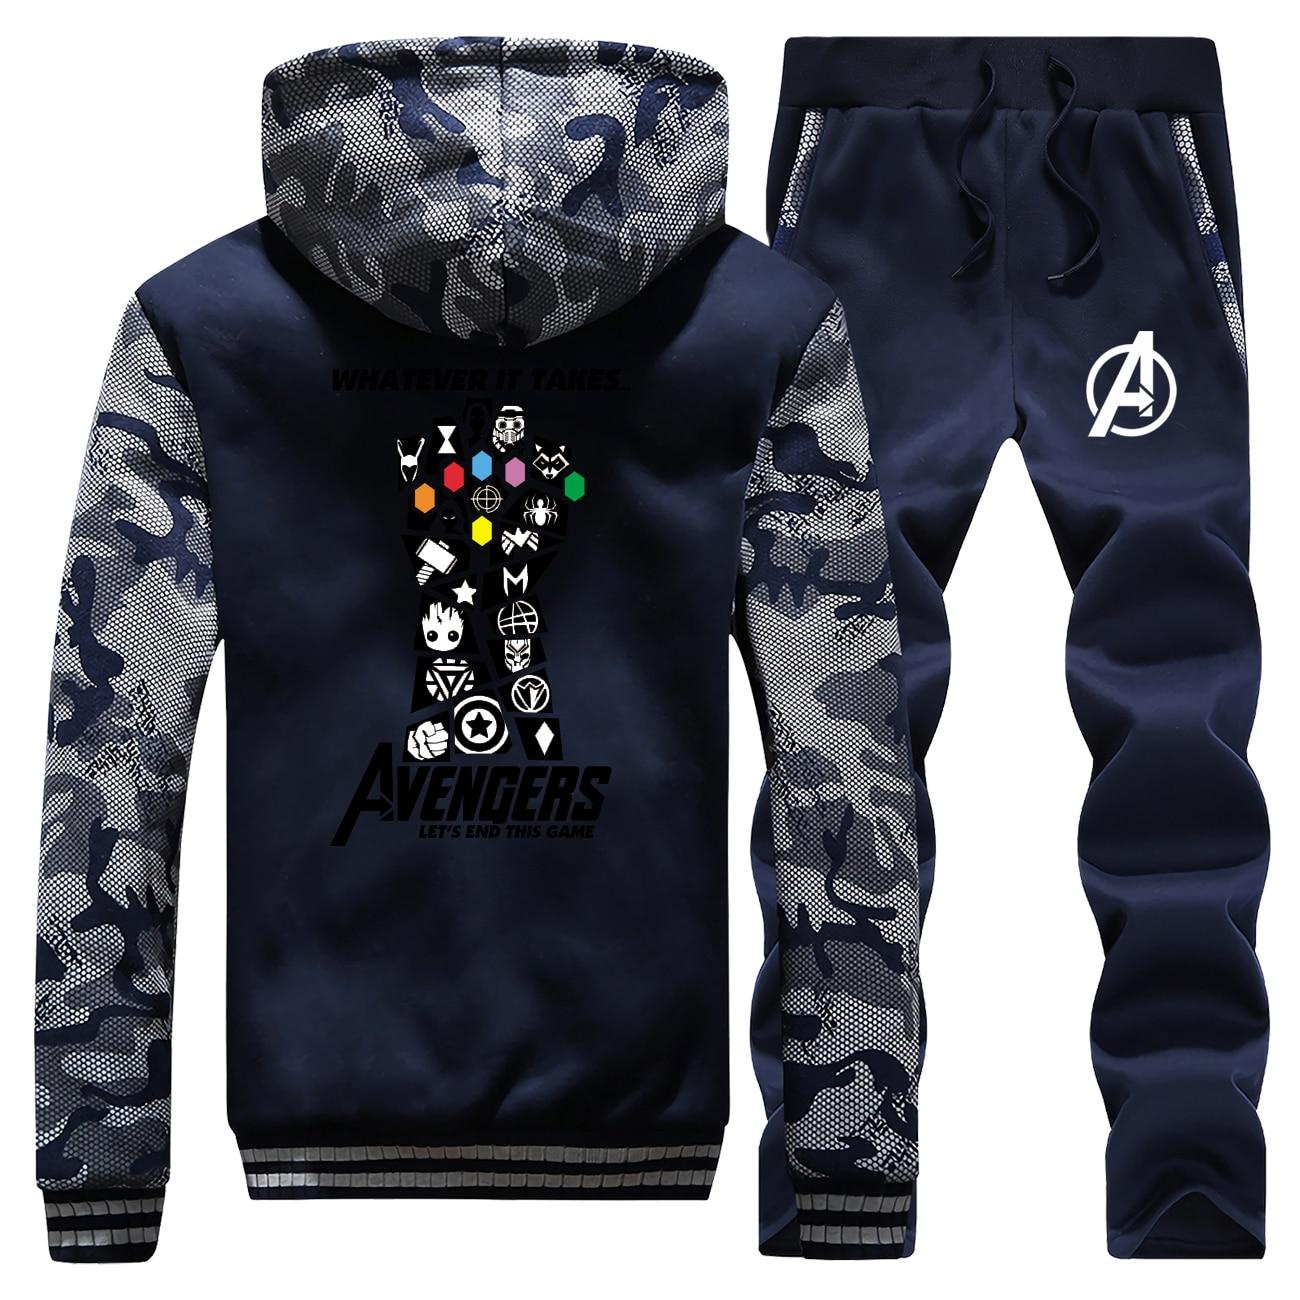 Marvel Thanos Infinity Gauntlet Jacket+Pant 2pcs Set Men Coat Thick Camouflage Sweatshirt Fashion Hoodies Mens Hip Hop Tracksuit